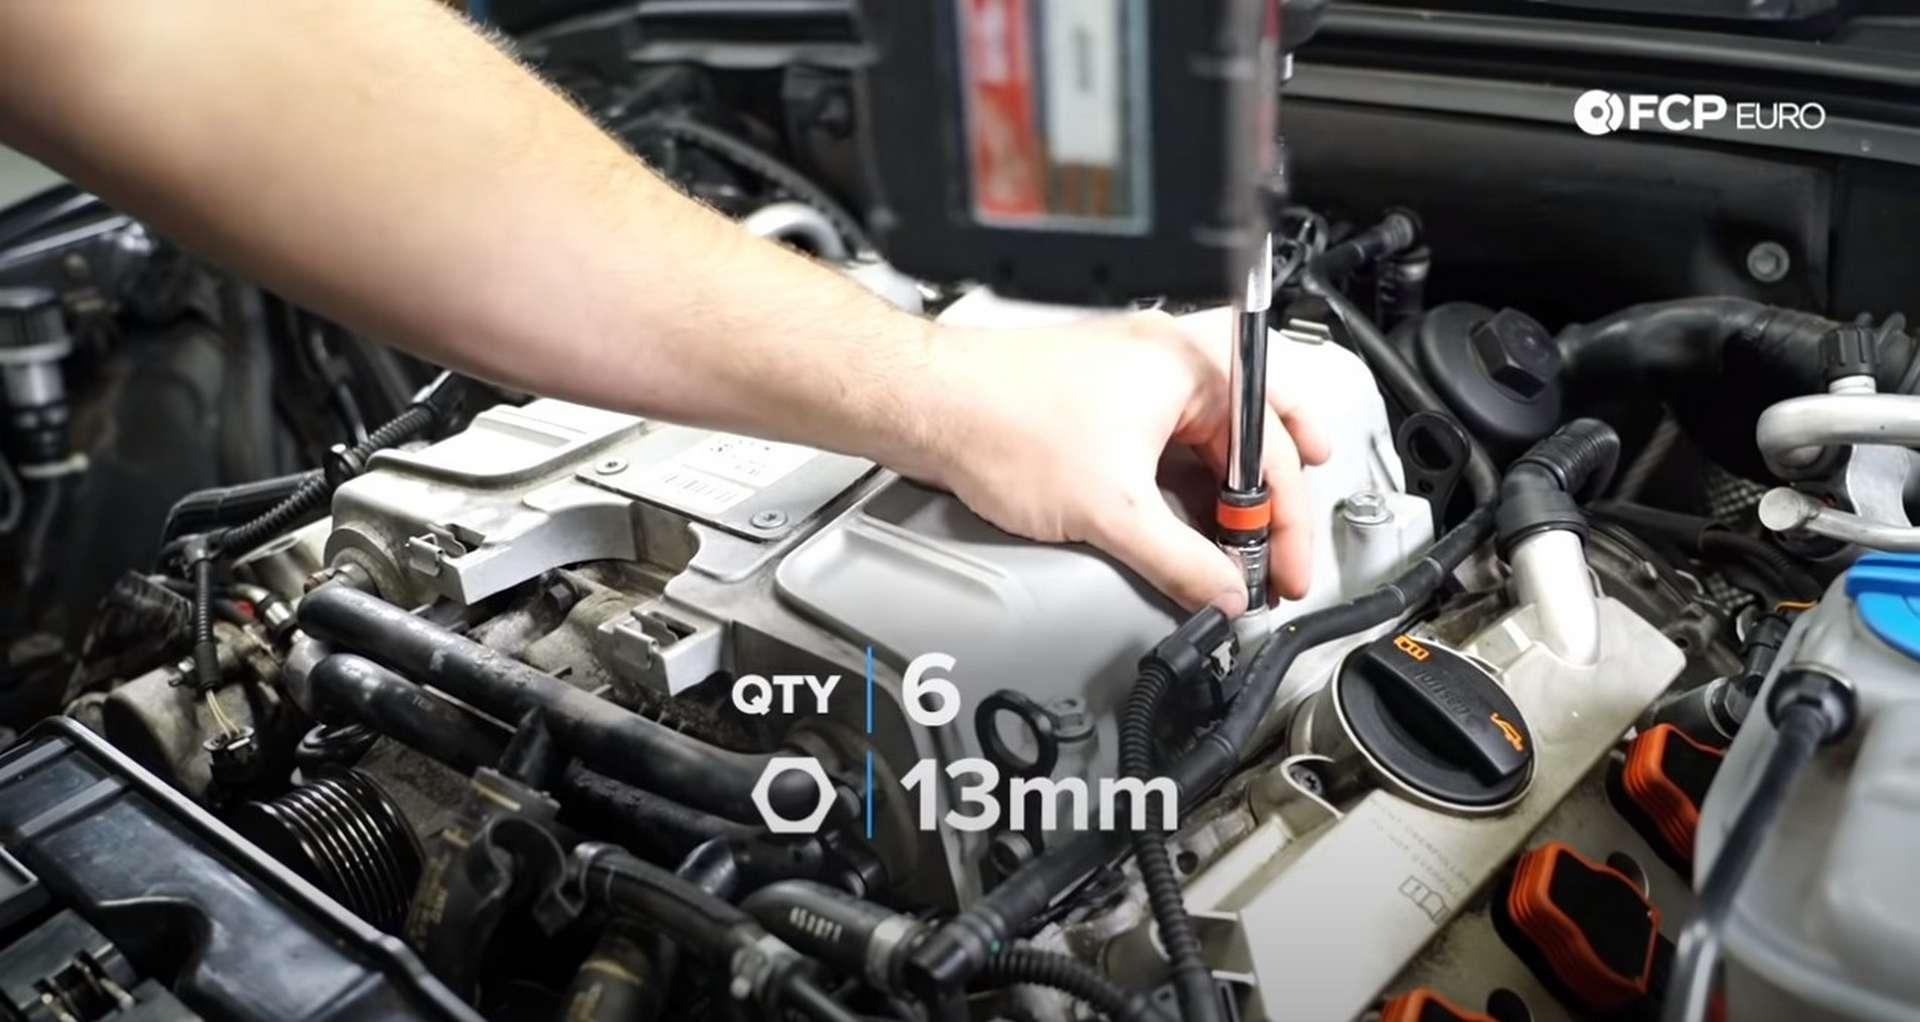 DIY Audi 3.0t Walnut Blasting Intake Valves tightening the supercharger nuts